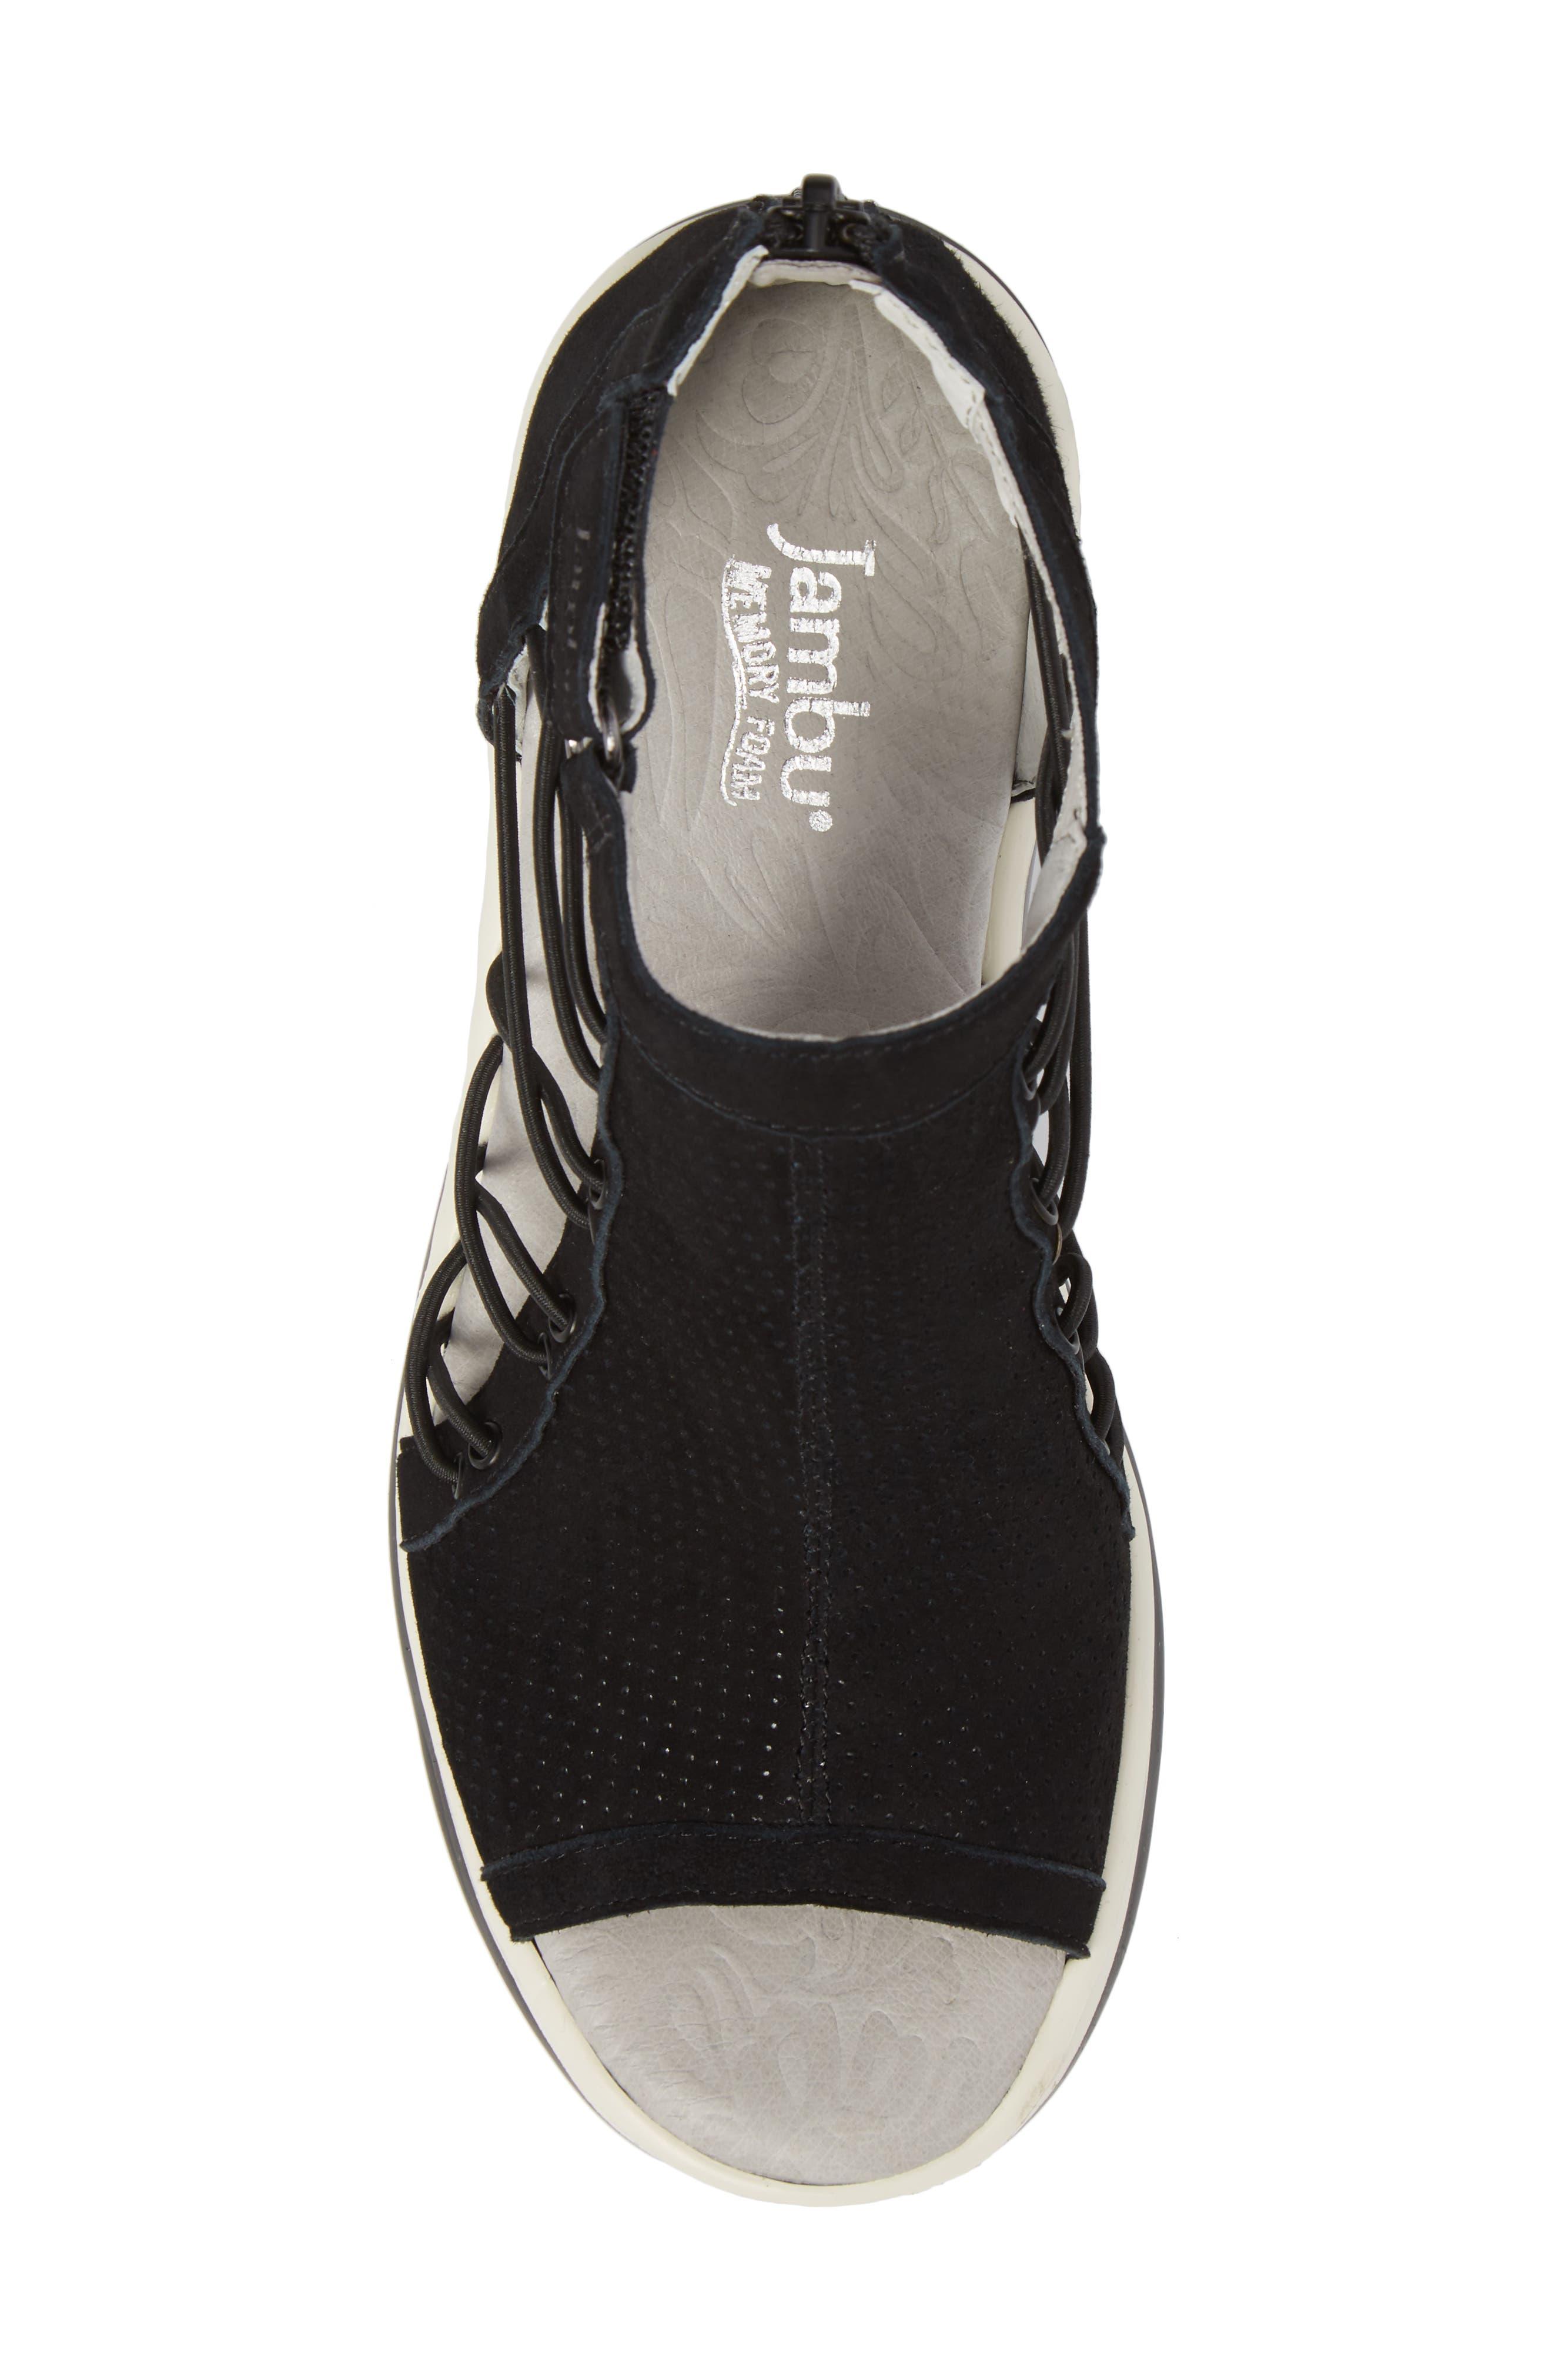 JAMBU, Naomi Perforated Wedge Sandal, Alternate thumbnail 5, color, BLACK SUEDE